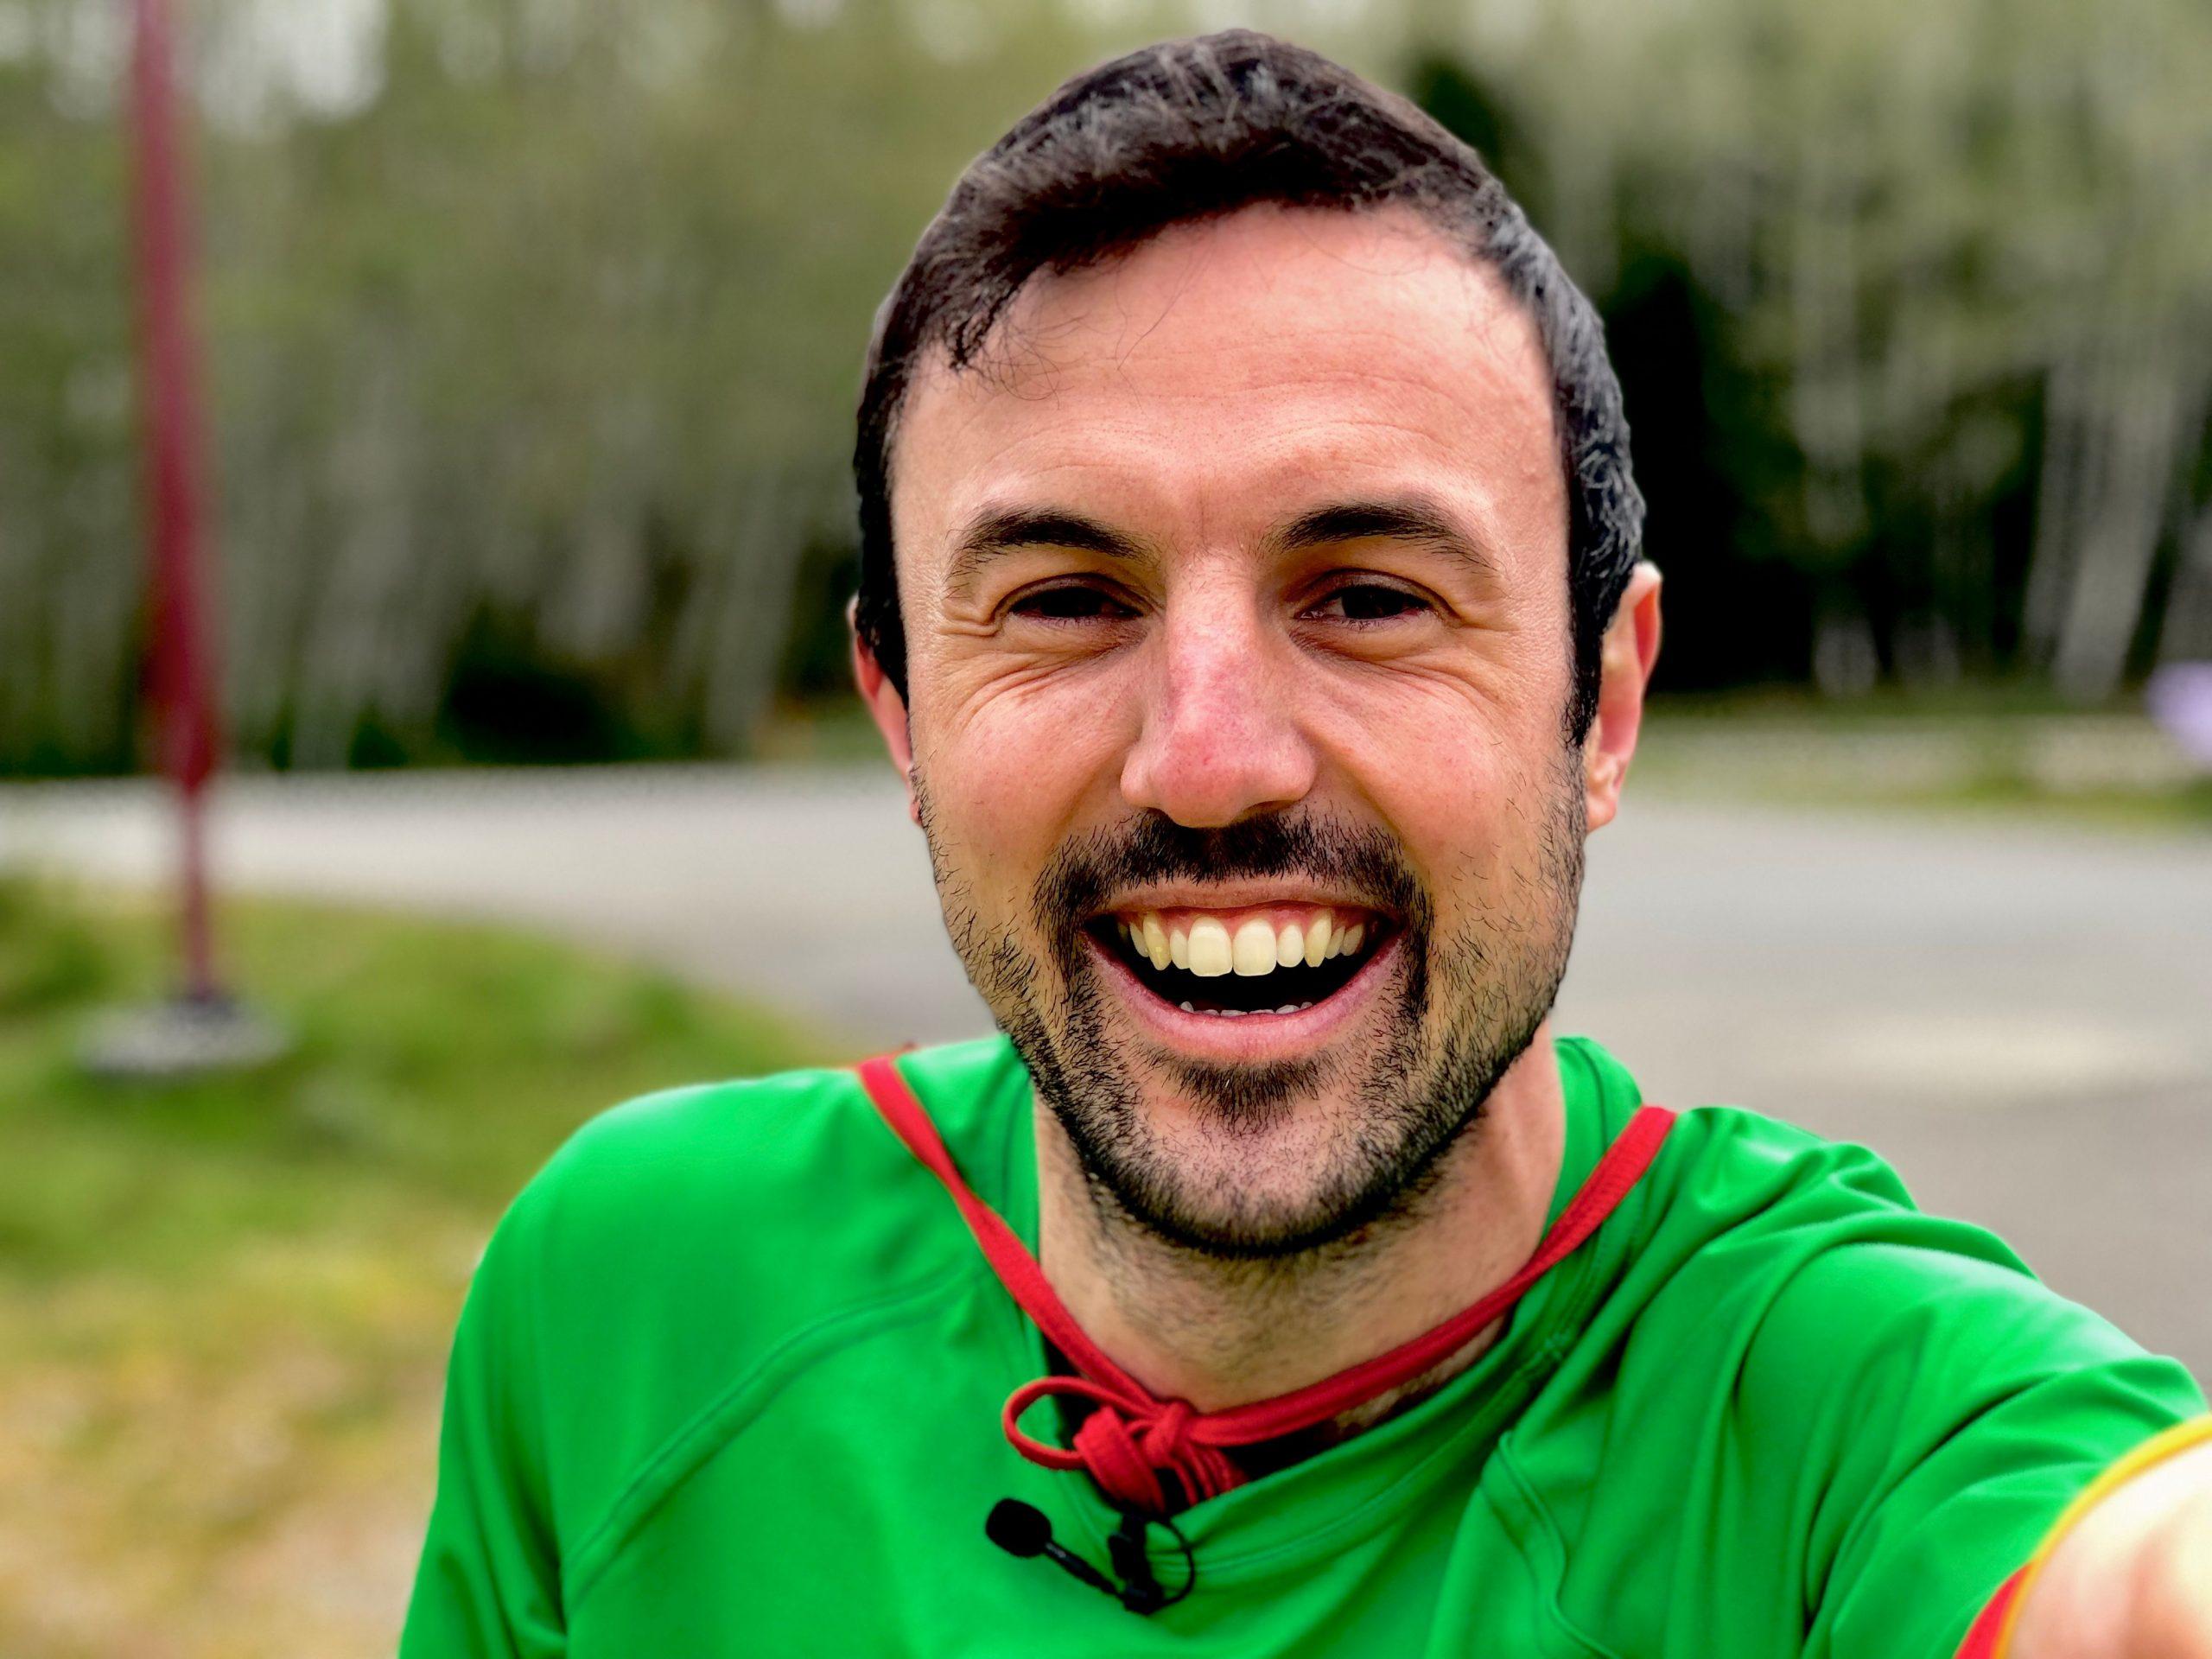 Motivational Speaker, Jamie MacDonald, known as Adventureman